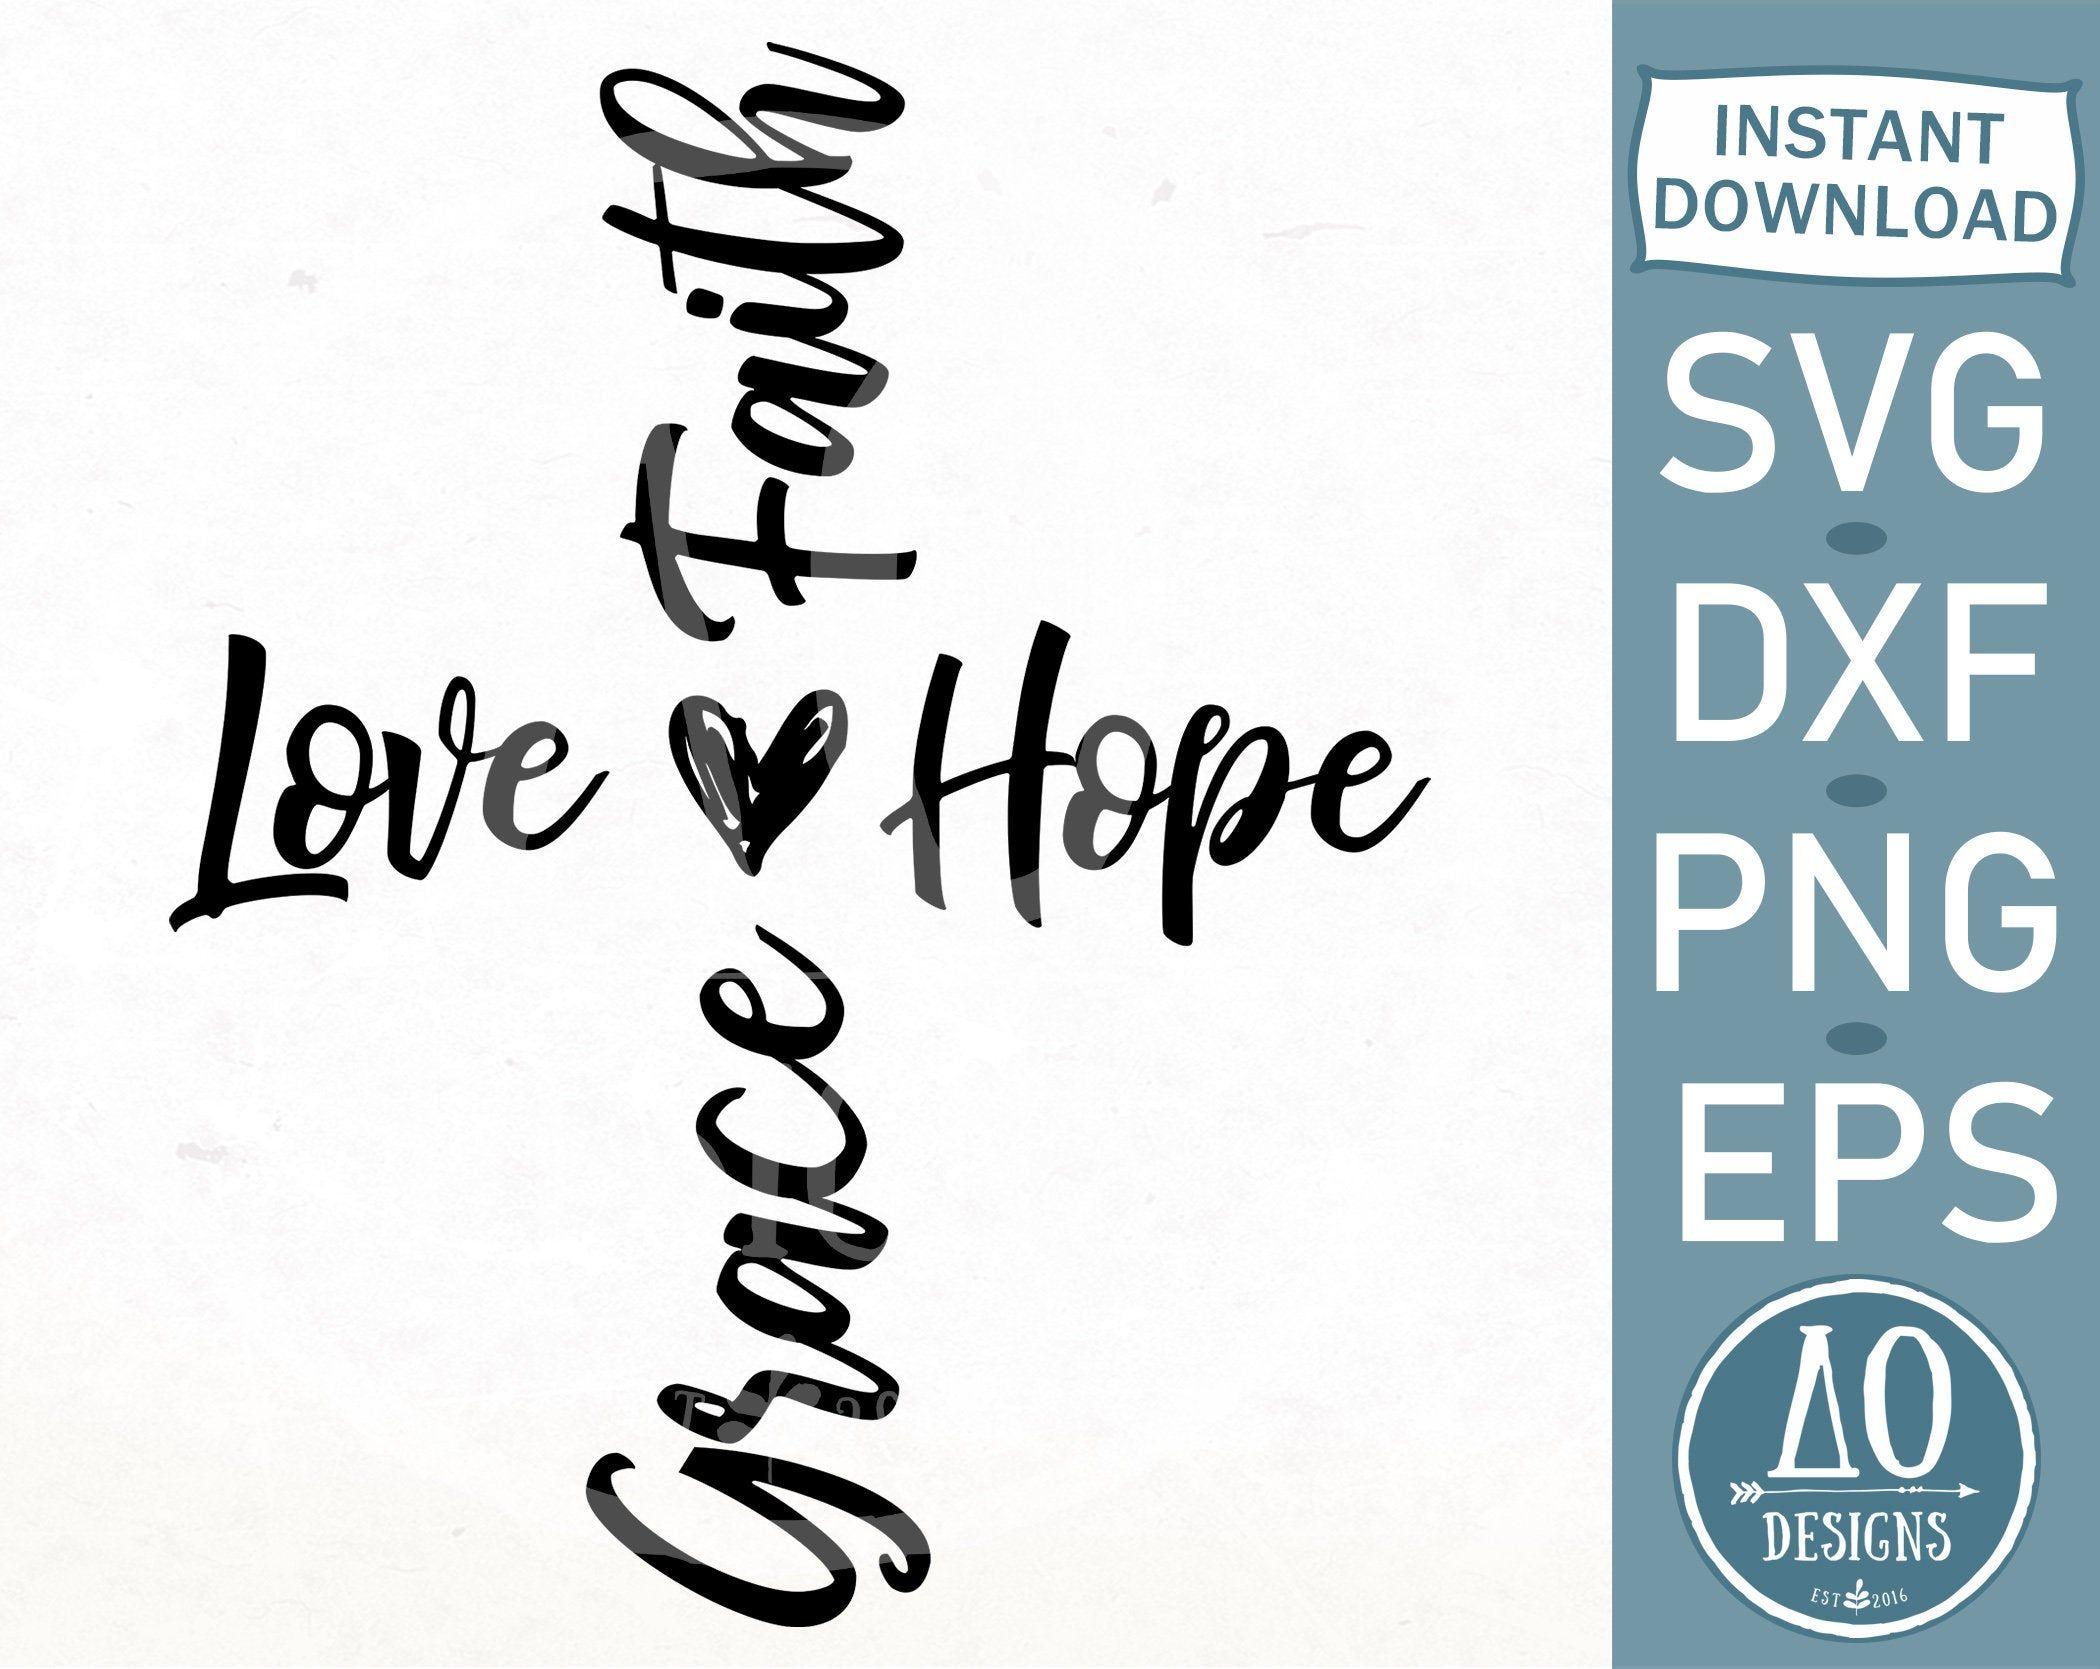 Cricut Husband List Cut Files Digital File Honey Please Cut Stencil SVG Honey Do List SVG Husband SVG